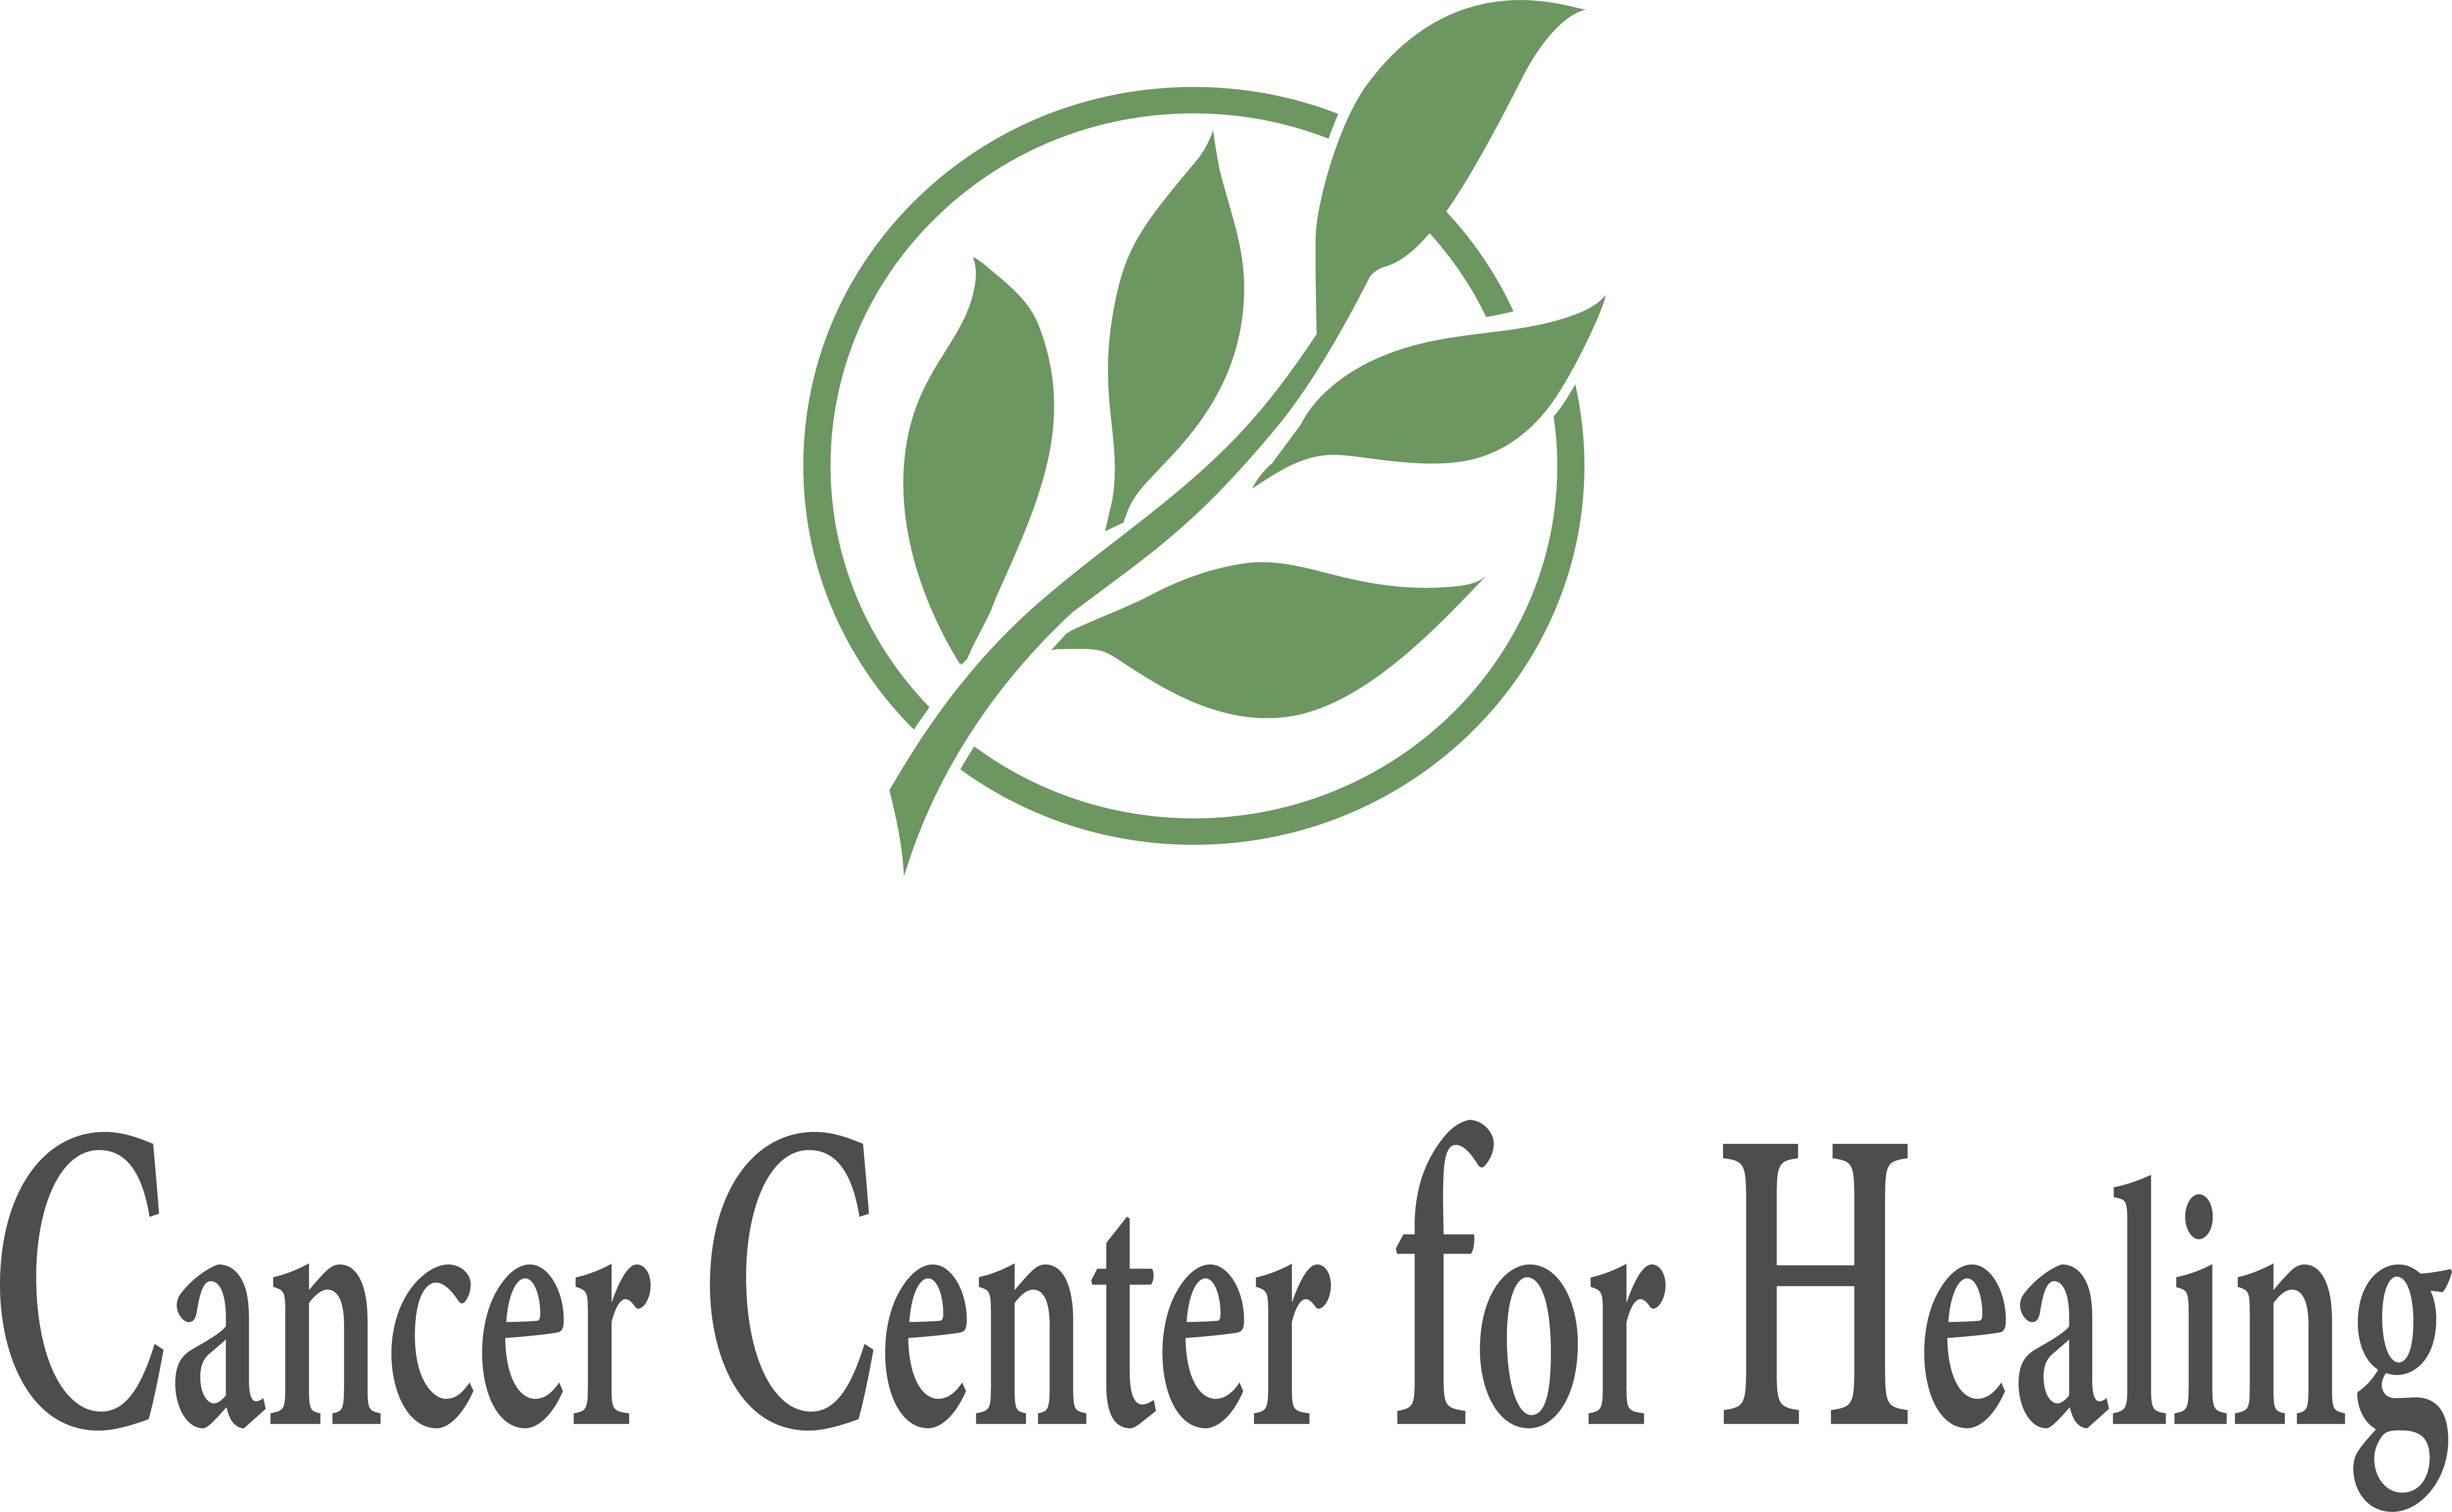 Cancer Center for Healing